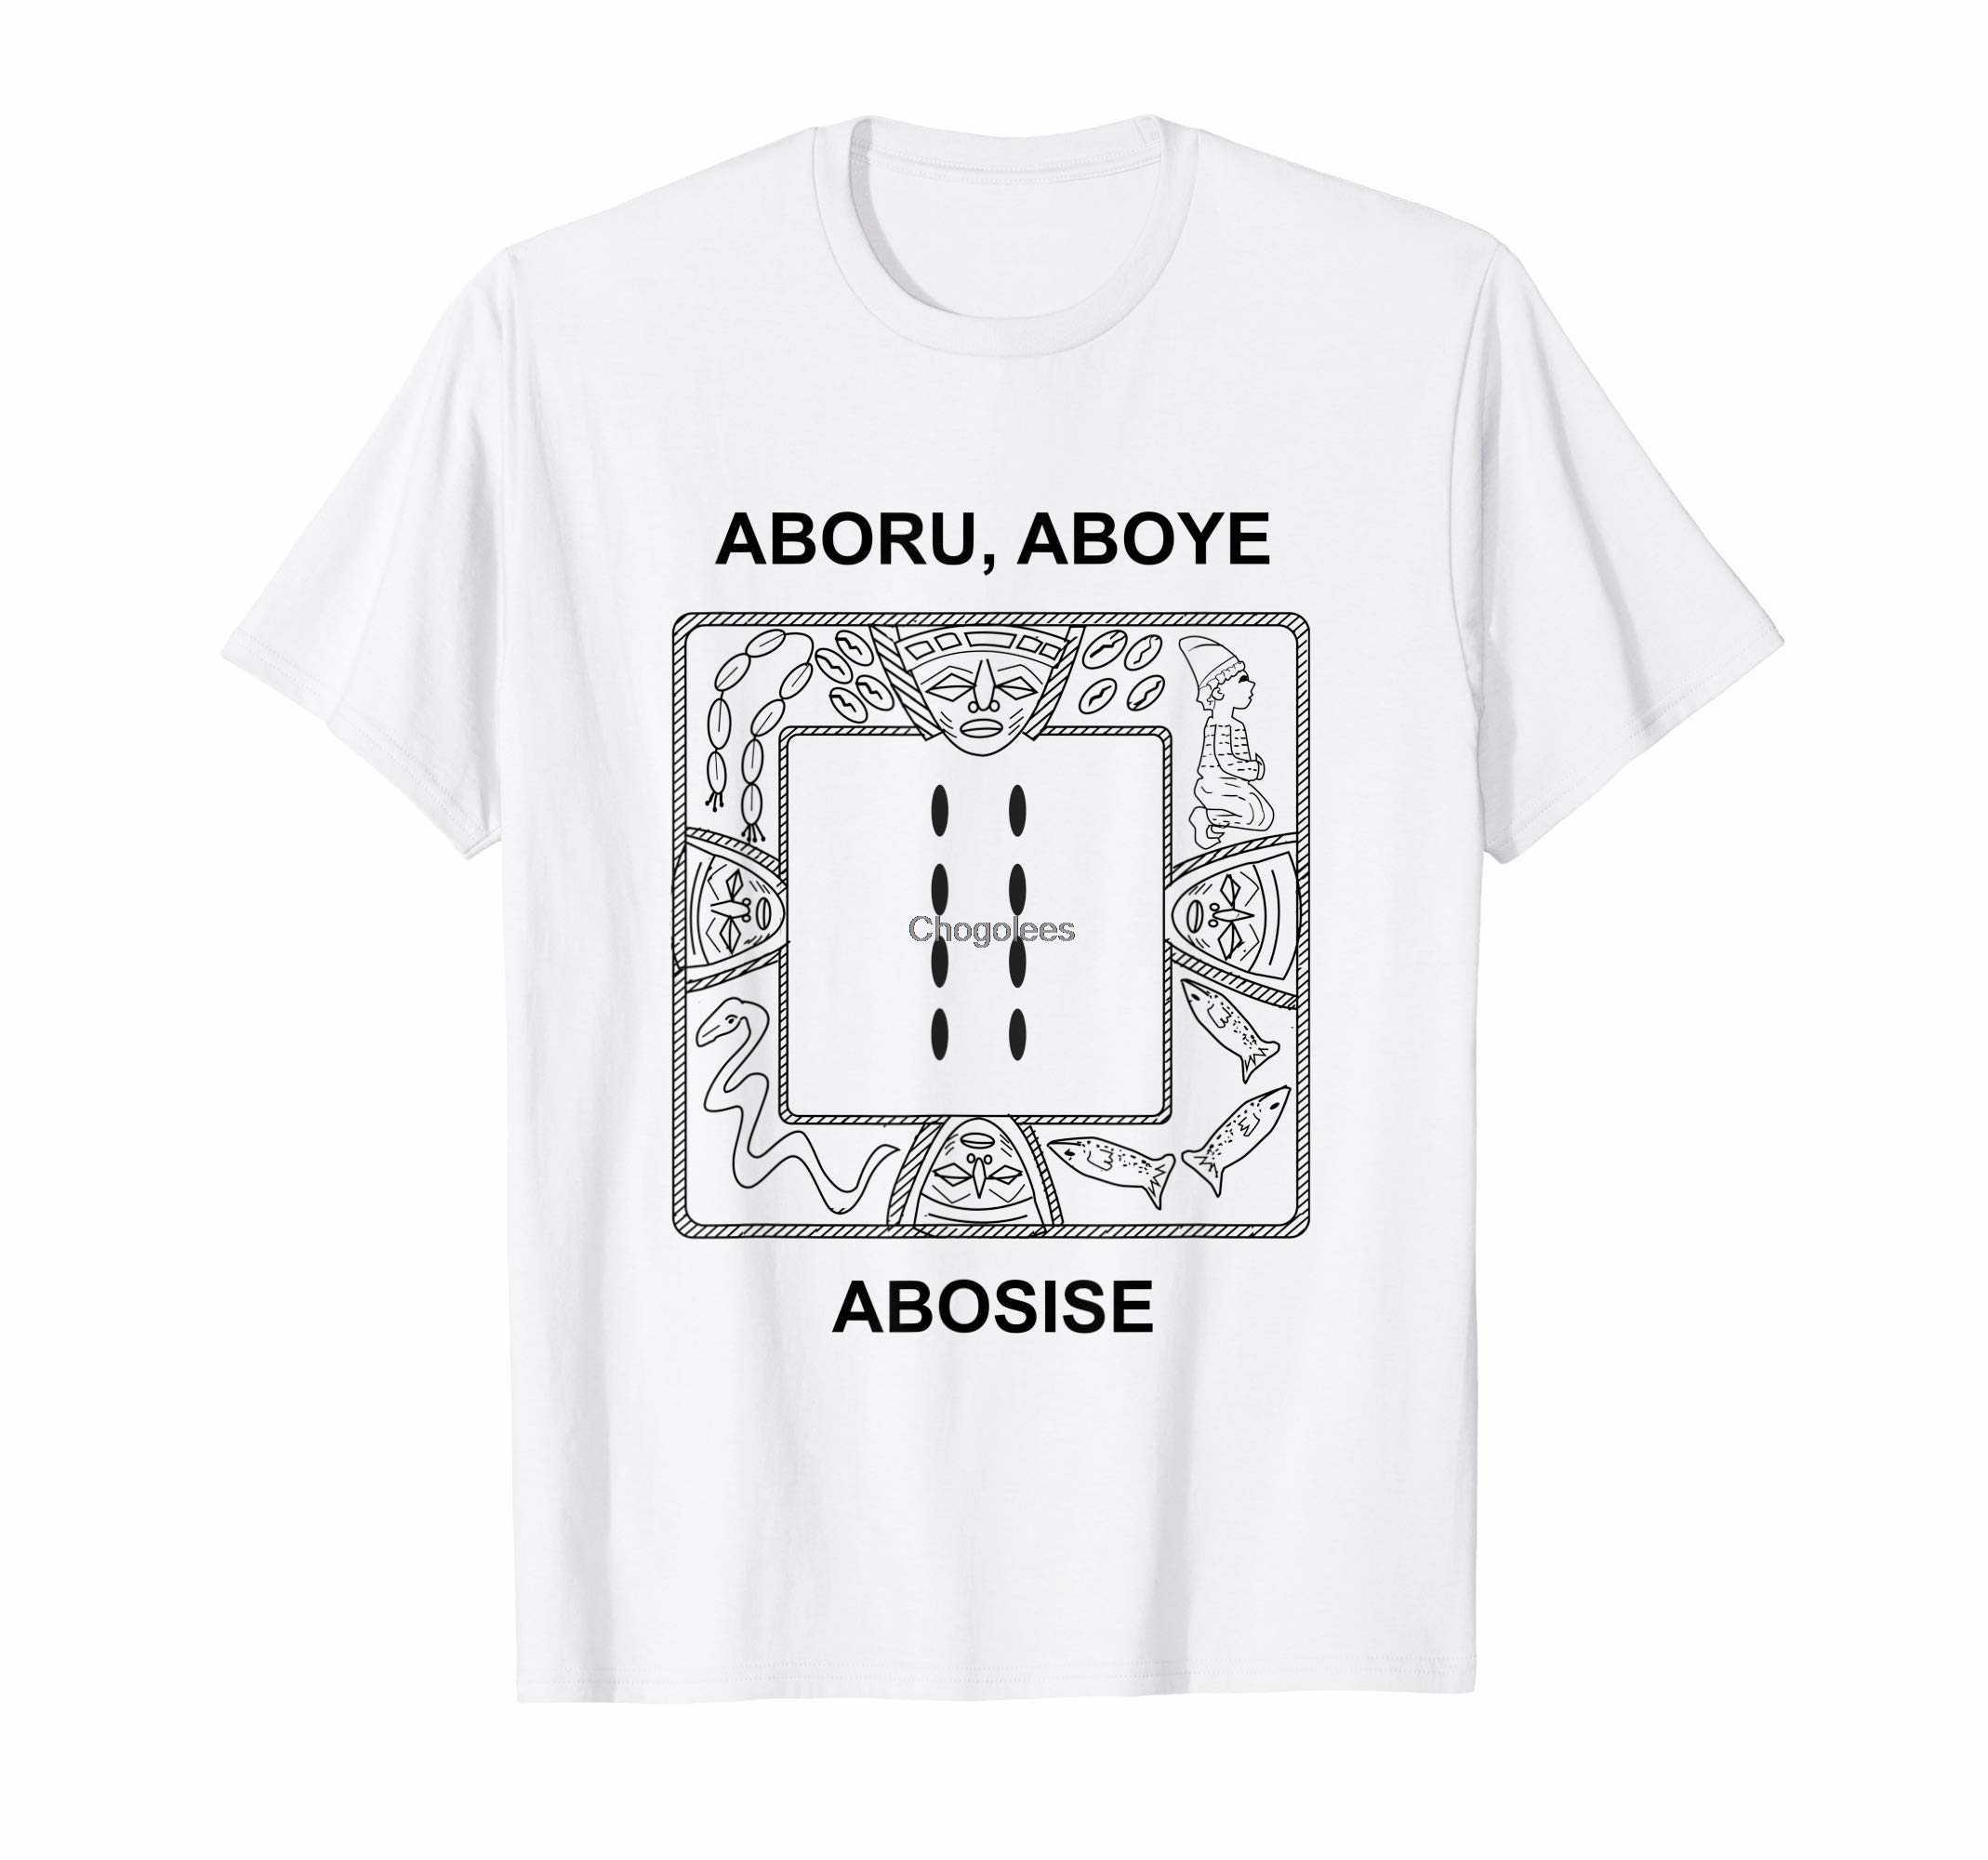 Футболка Eji Ogbe Ifa Aboru Aboye Abosise Yoruba-sq opon